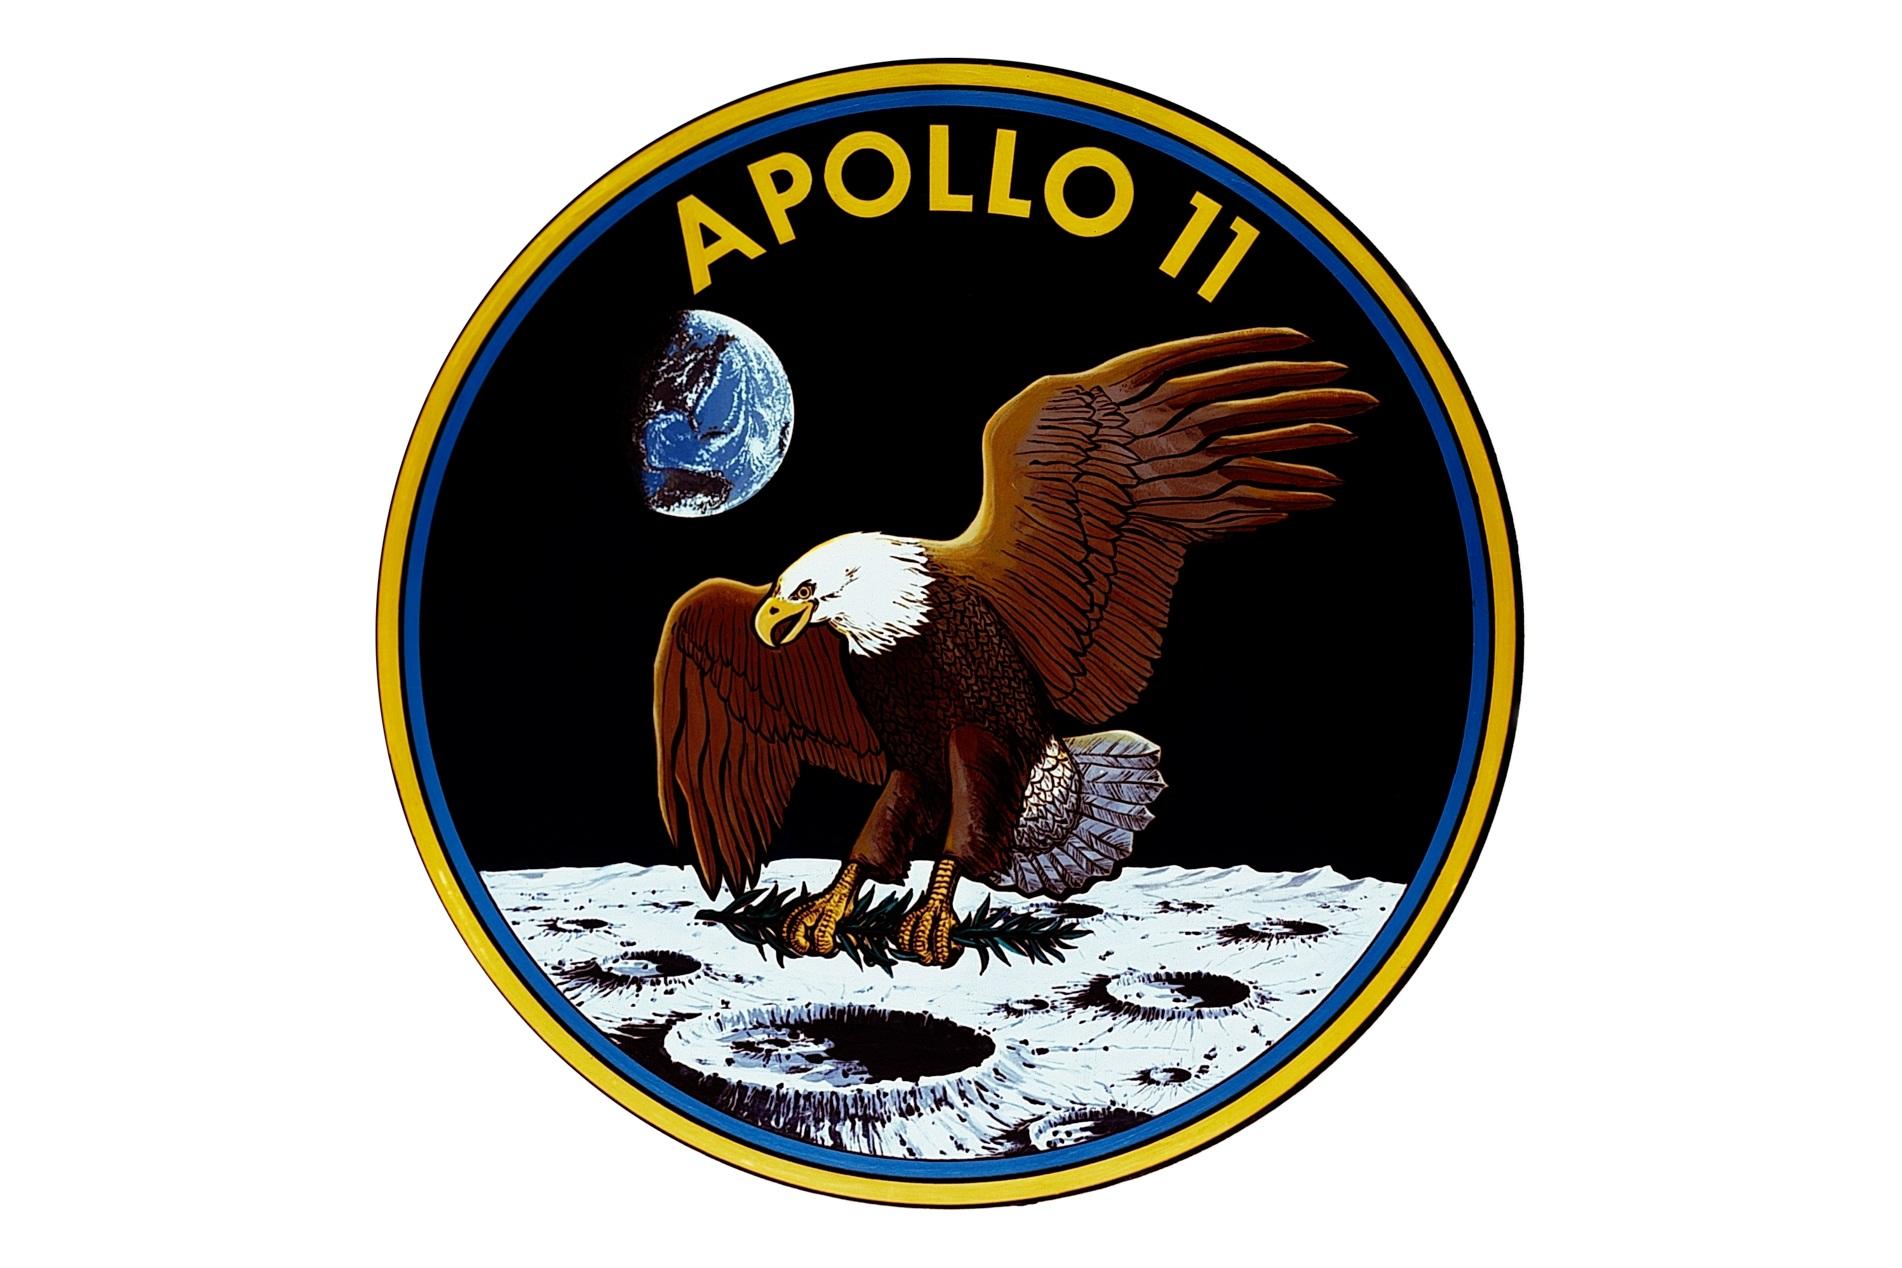 Apollo+11jkfdjfdjhfd.jpg